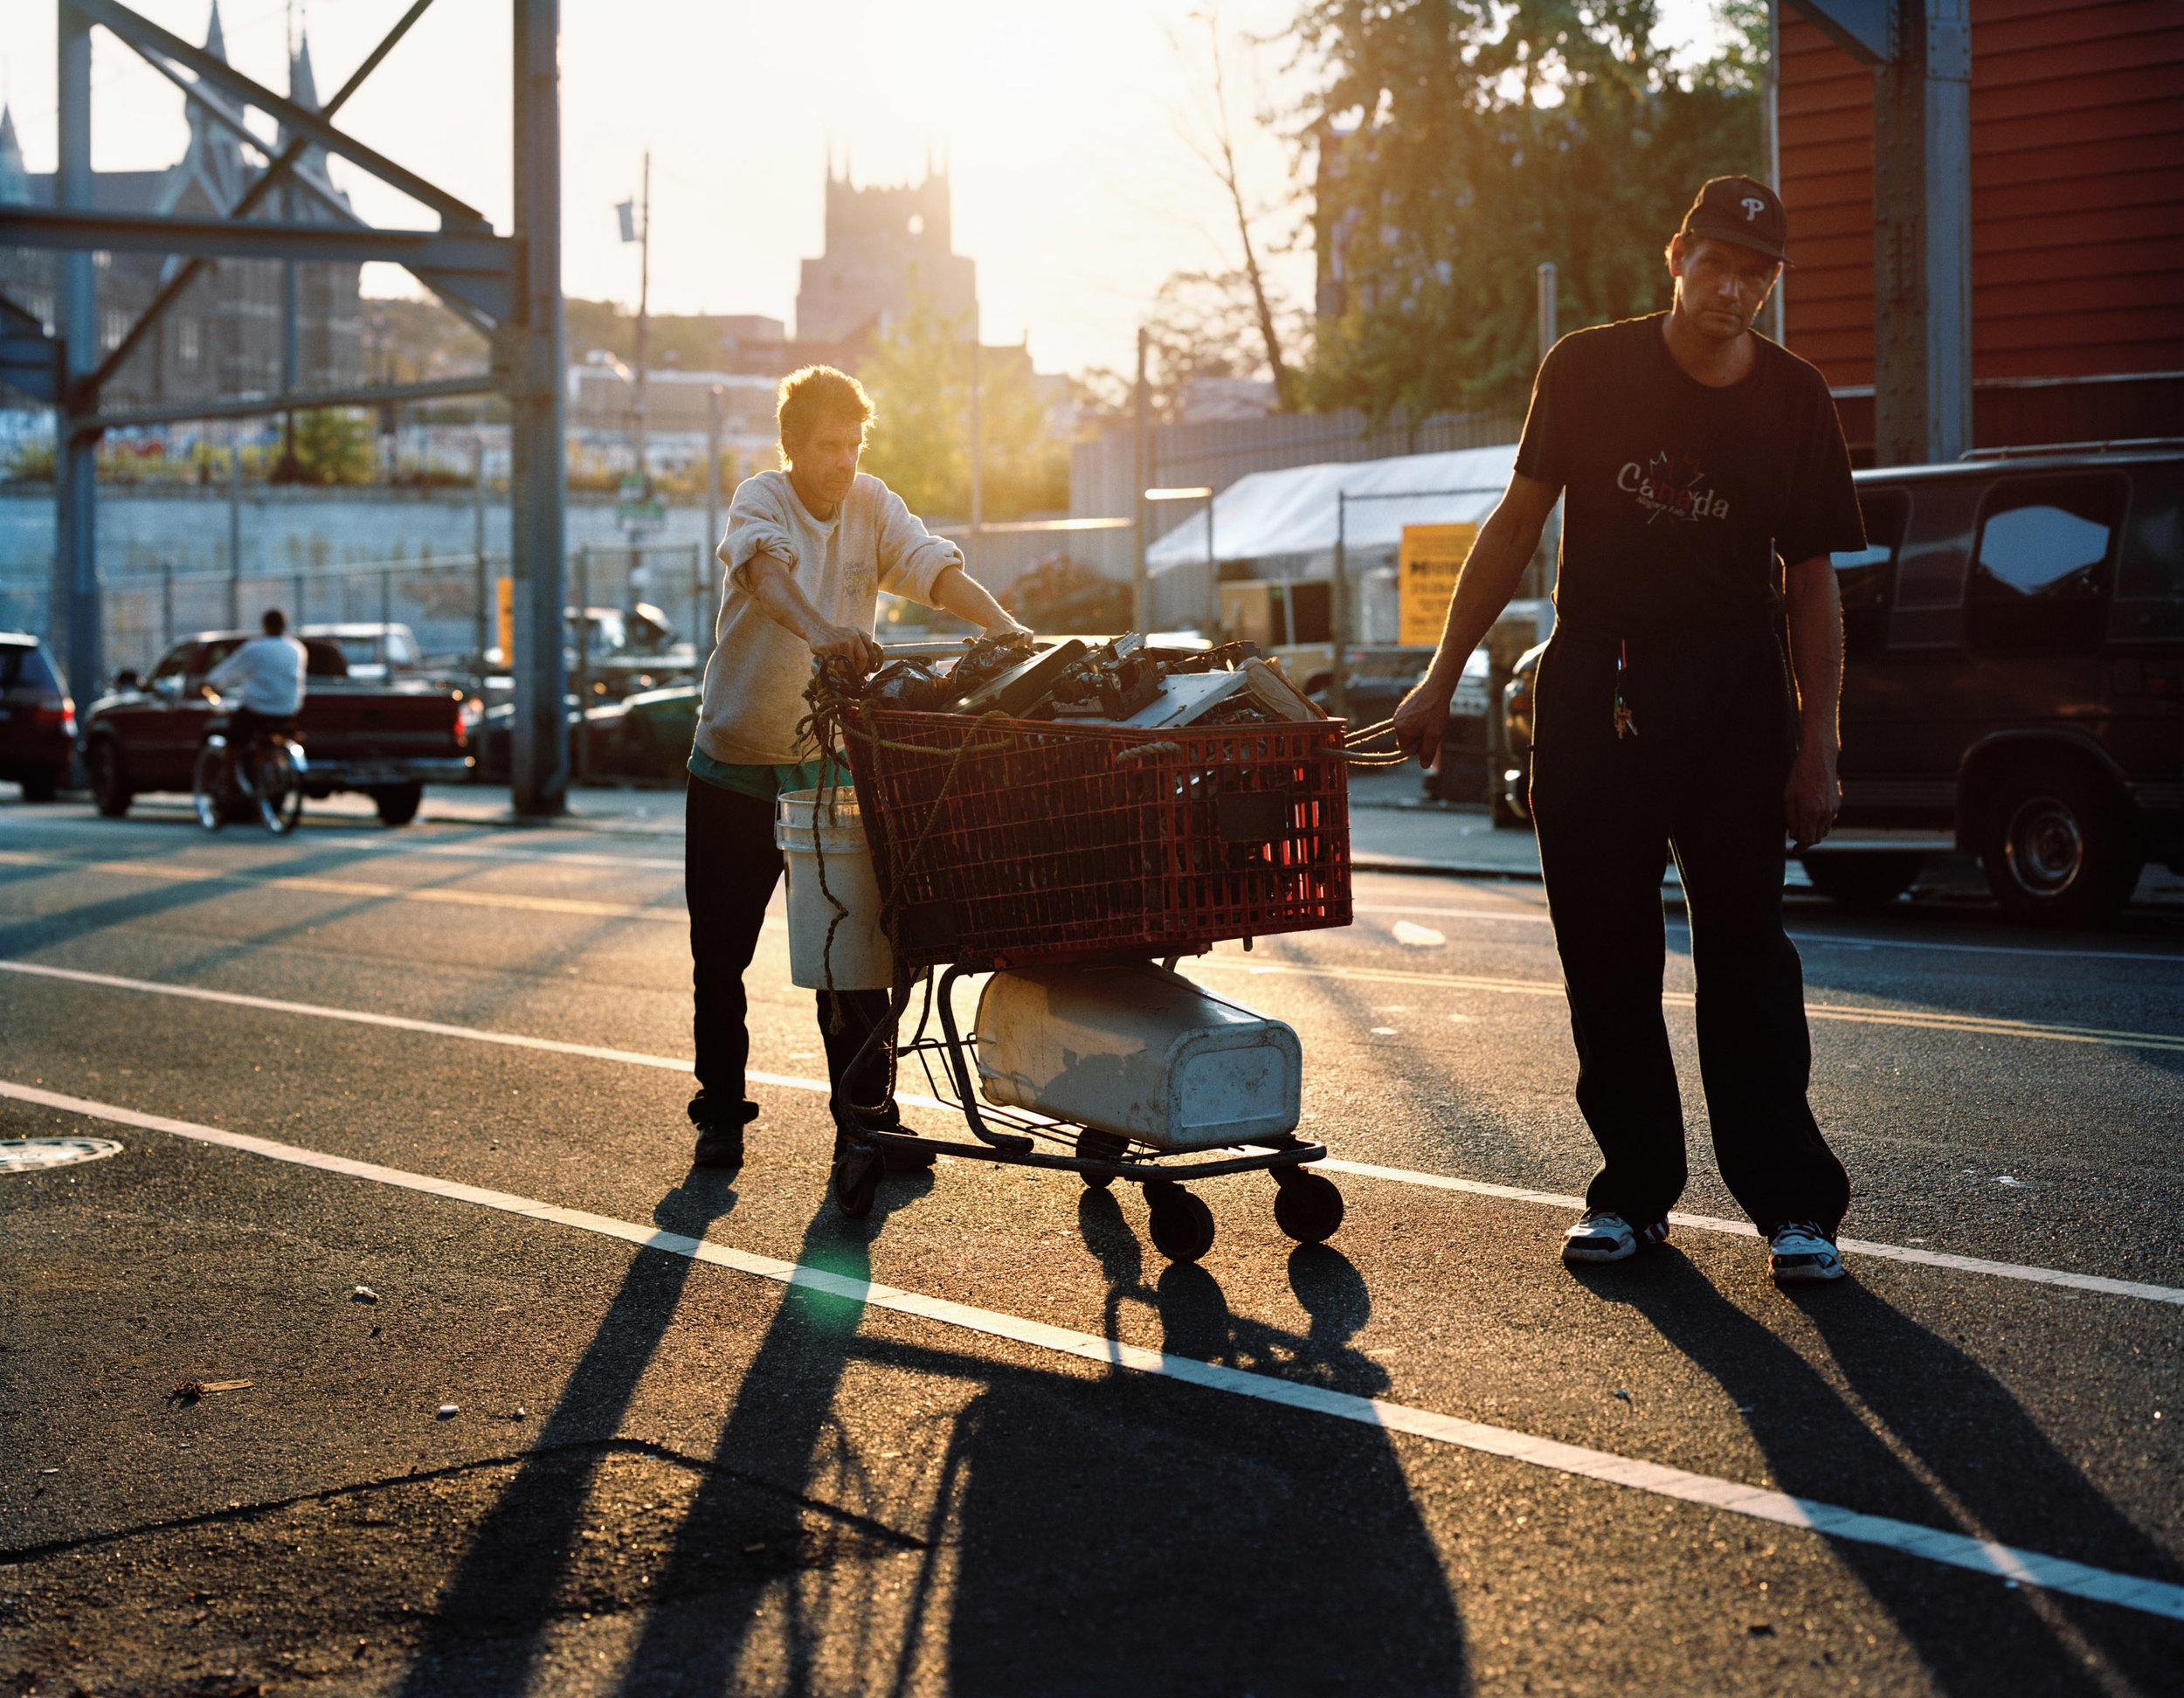 Scrappers. Kensington Ave. 2010. © Jeffrey Stockbridge